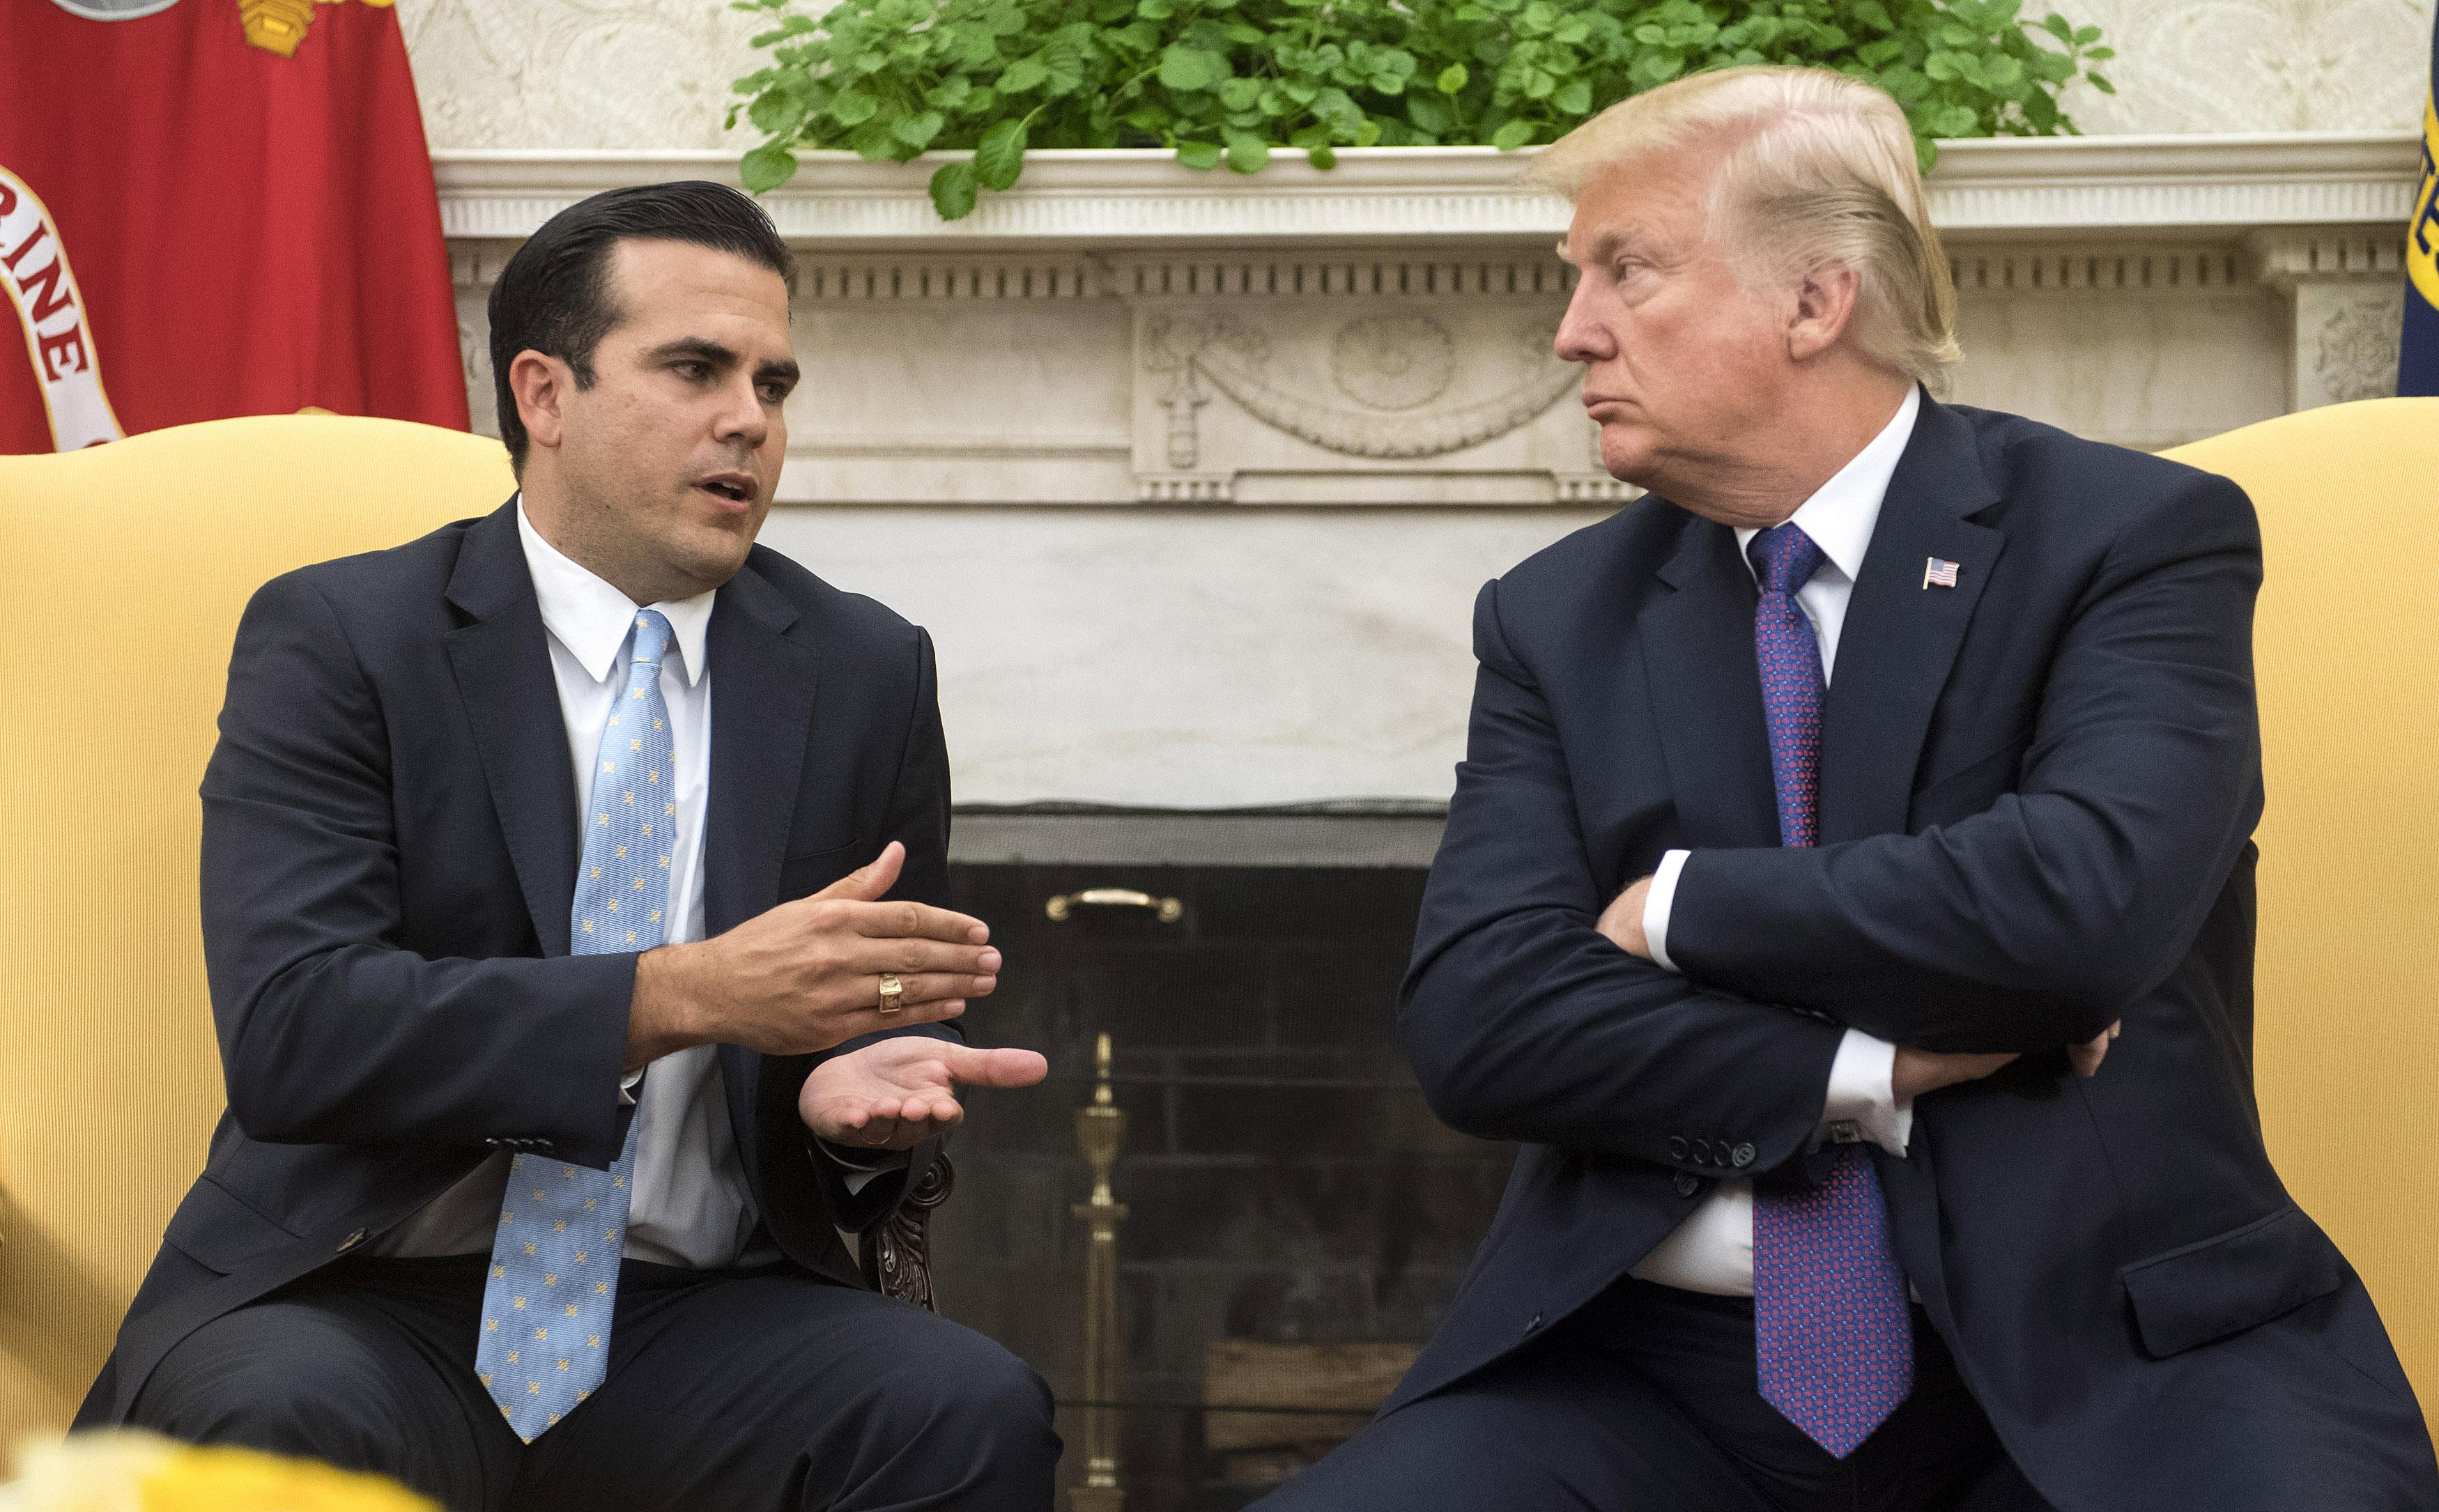 Ricardo Roselló y Donald Trump